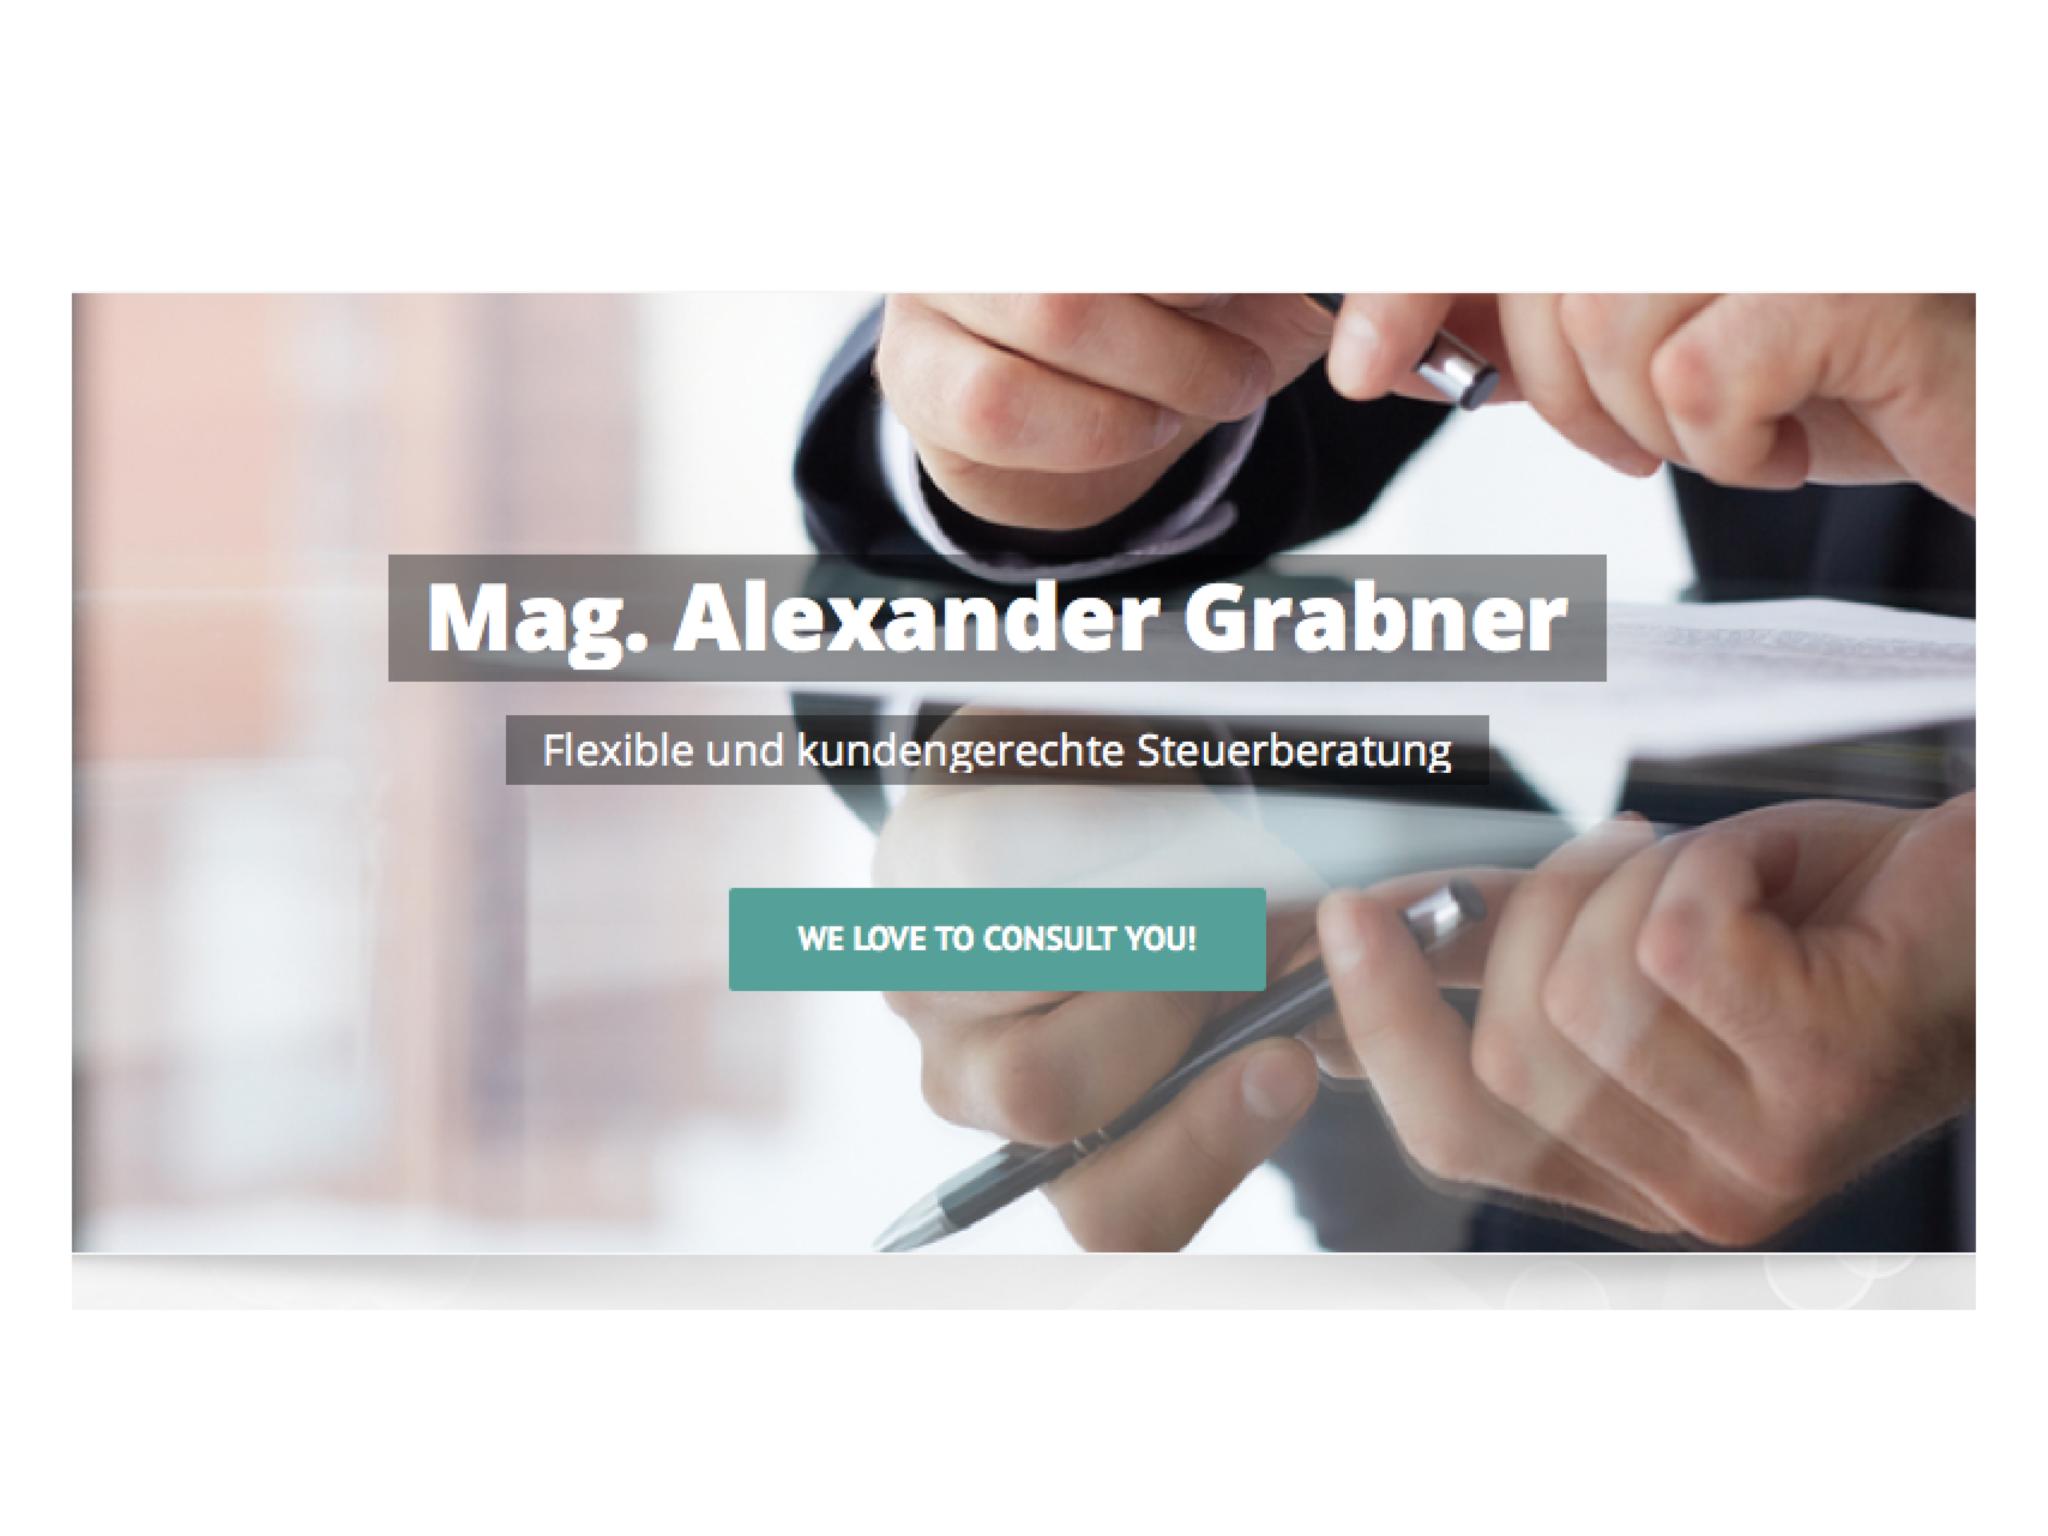 Steuerberatung Grabner